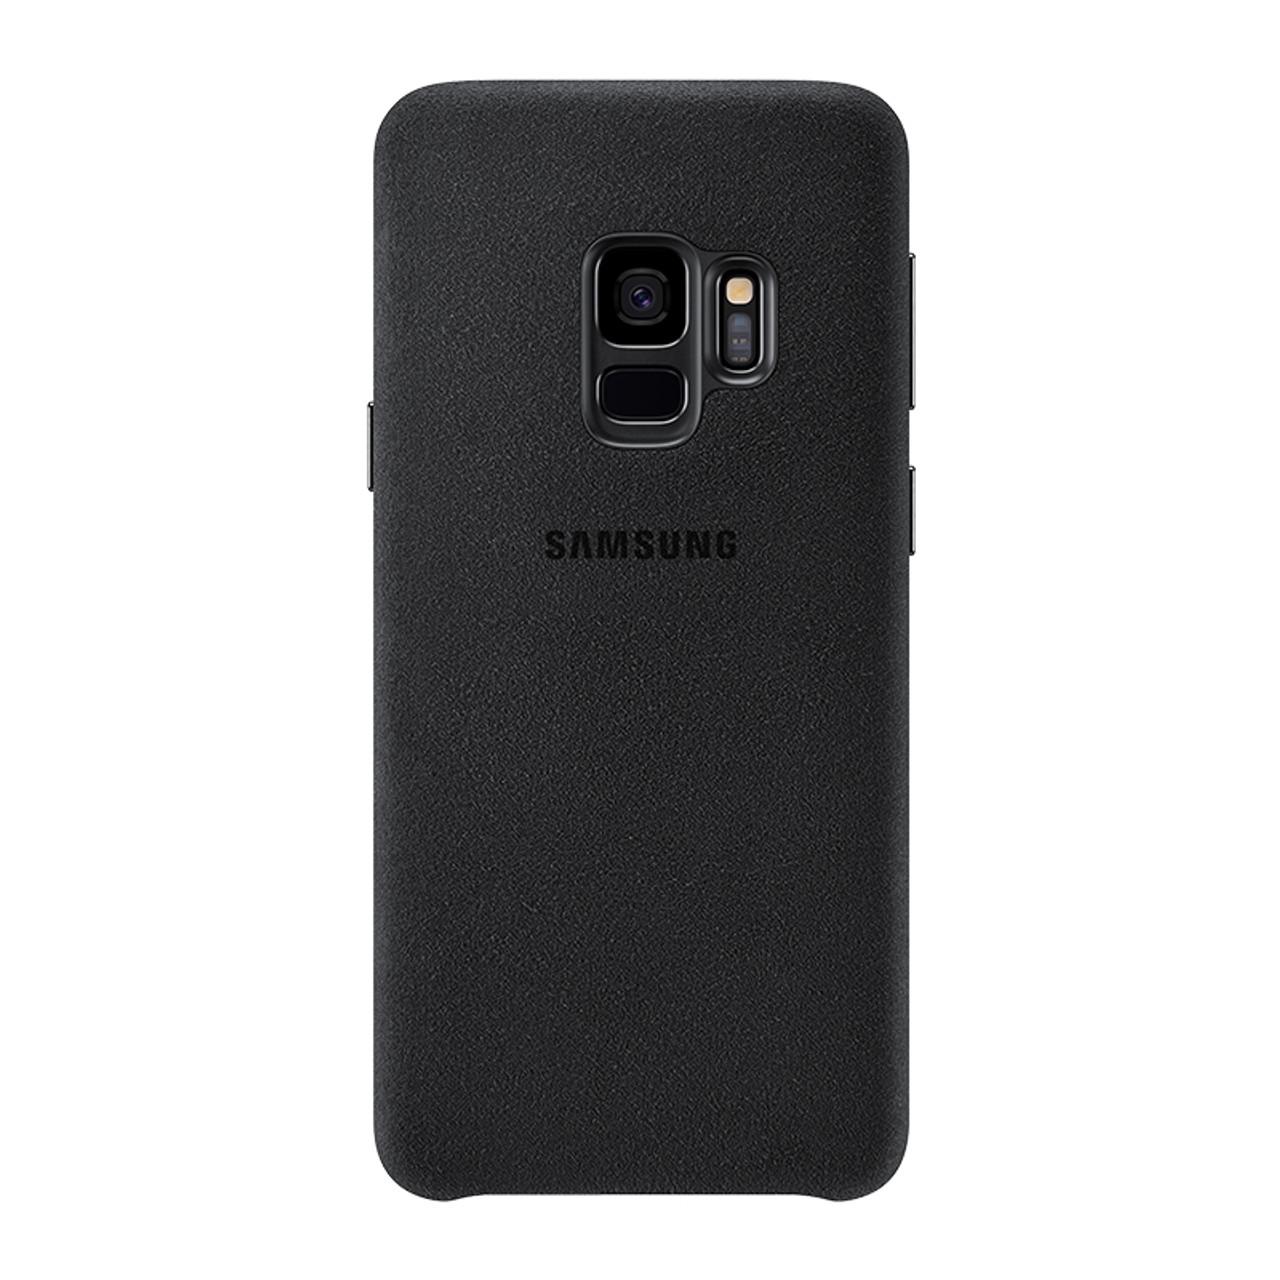 watch bfa37 ed8af 100% GENUINE Original Samsung G960 G965 Galaxy S9 S9 Plus S9+ ALCANTARA  Cover Anti-knock Back Case luxury